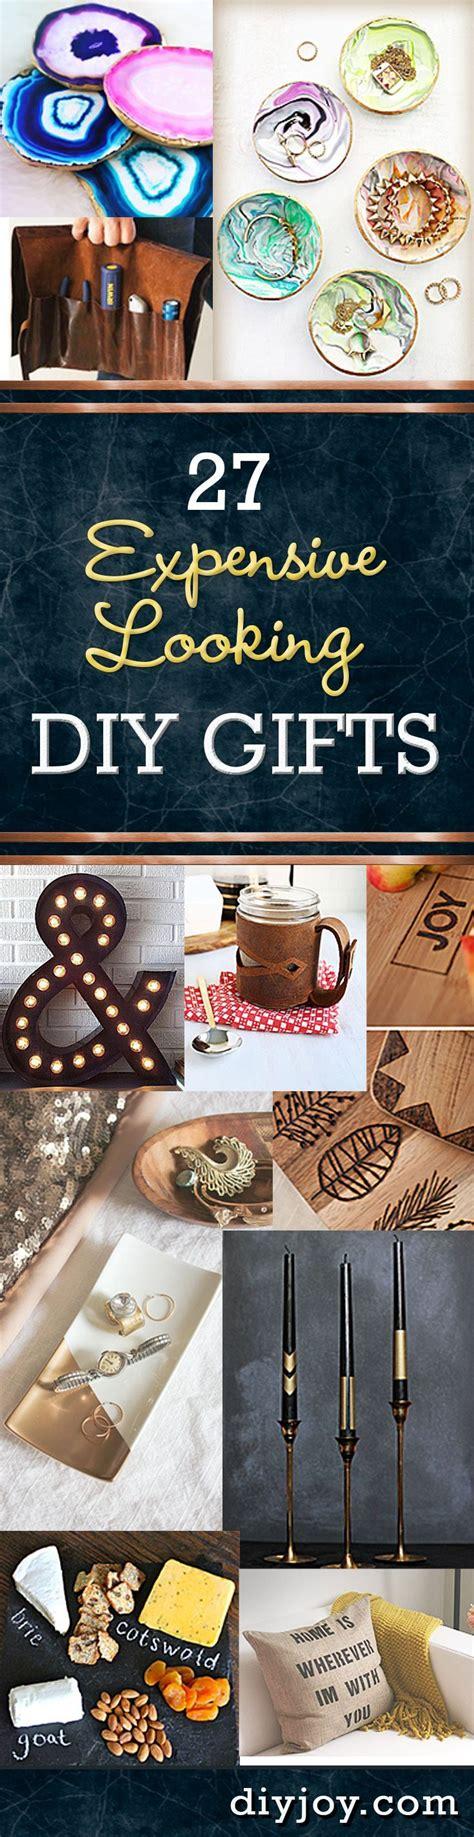 17 ideas about handmade gifts on pinterest homemade